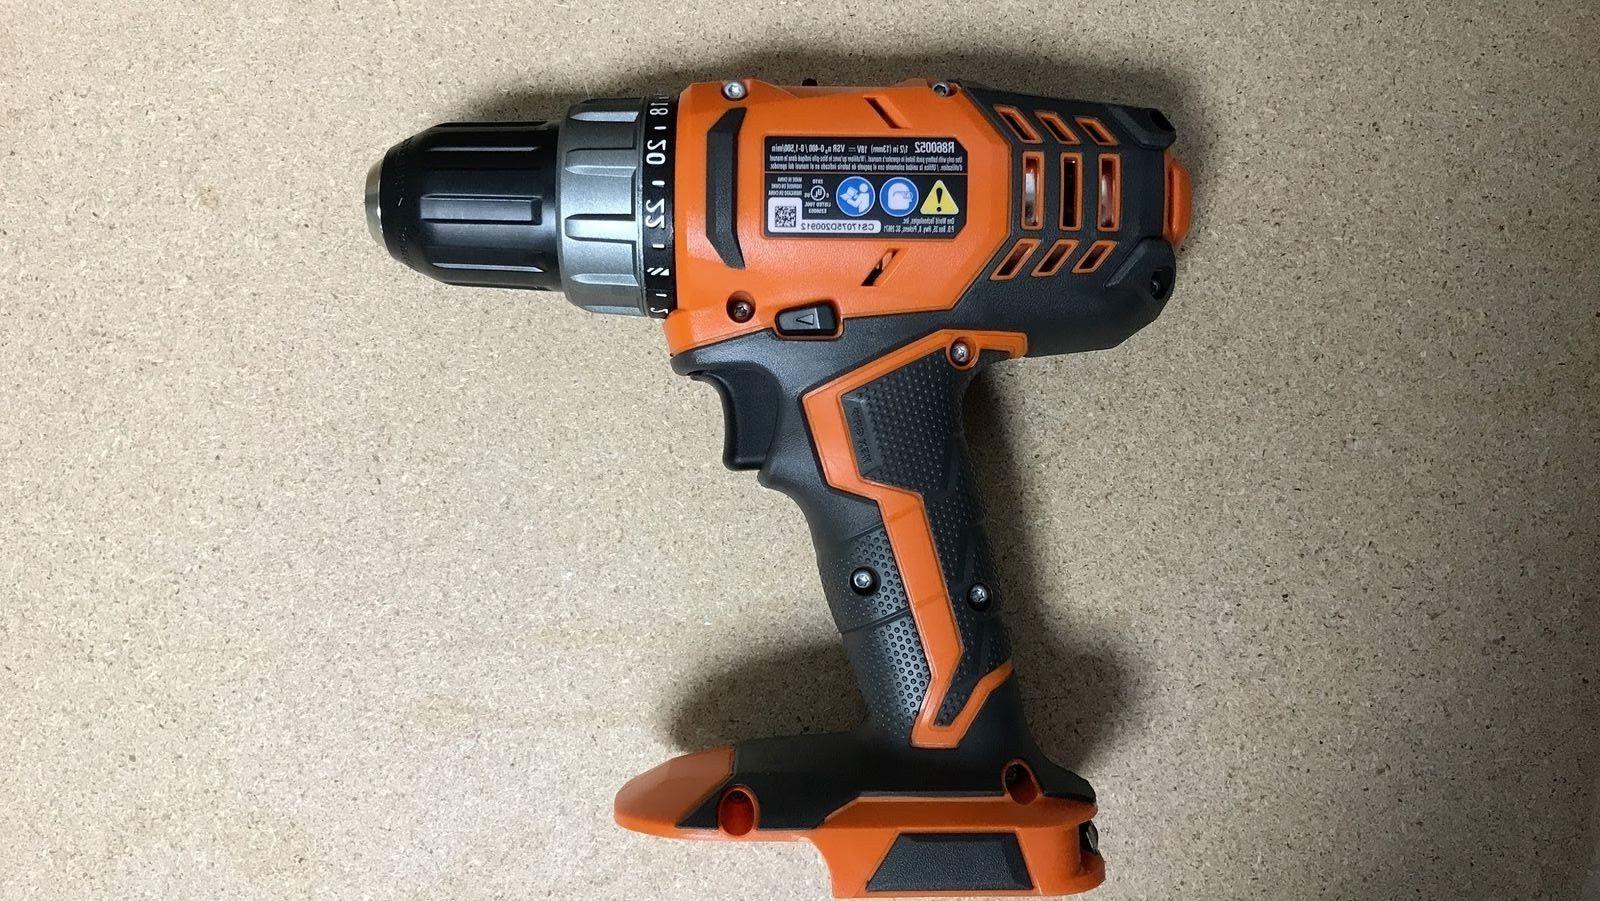 New RIDGID 18-Volt Cordless 1/2 in. Compact Drill/Driver